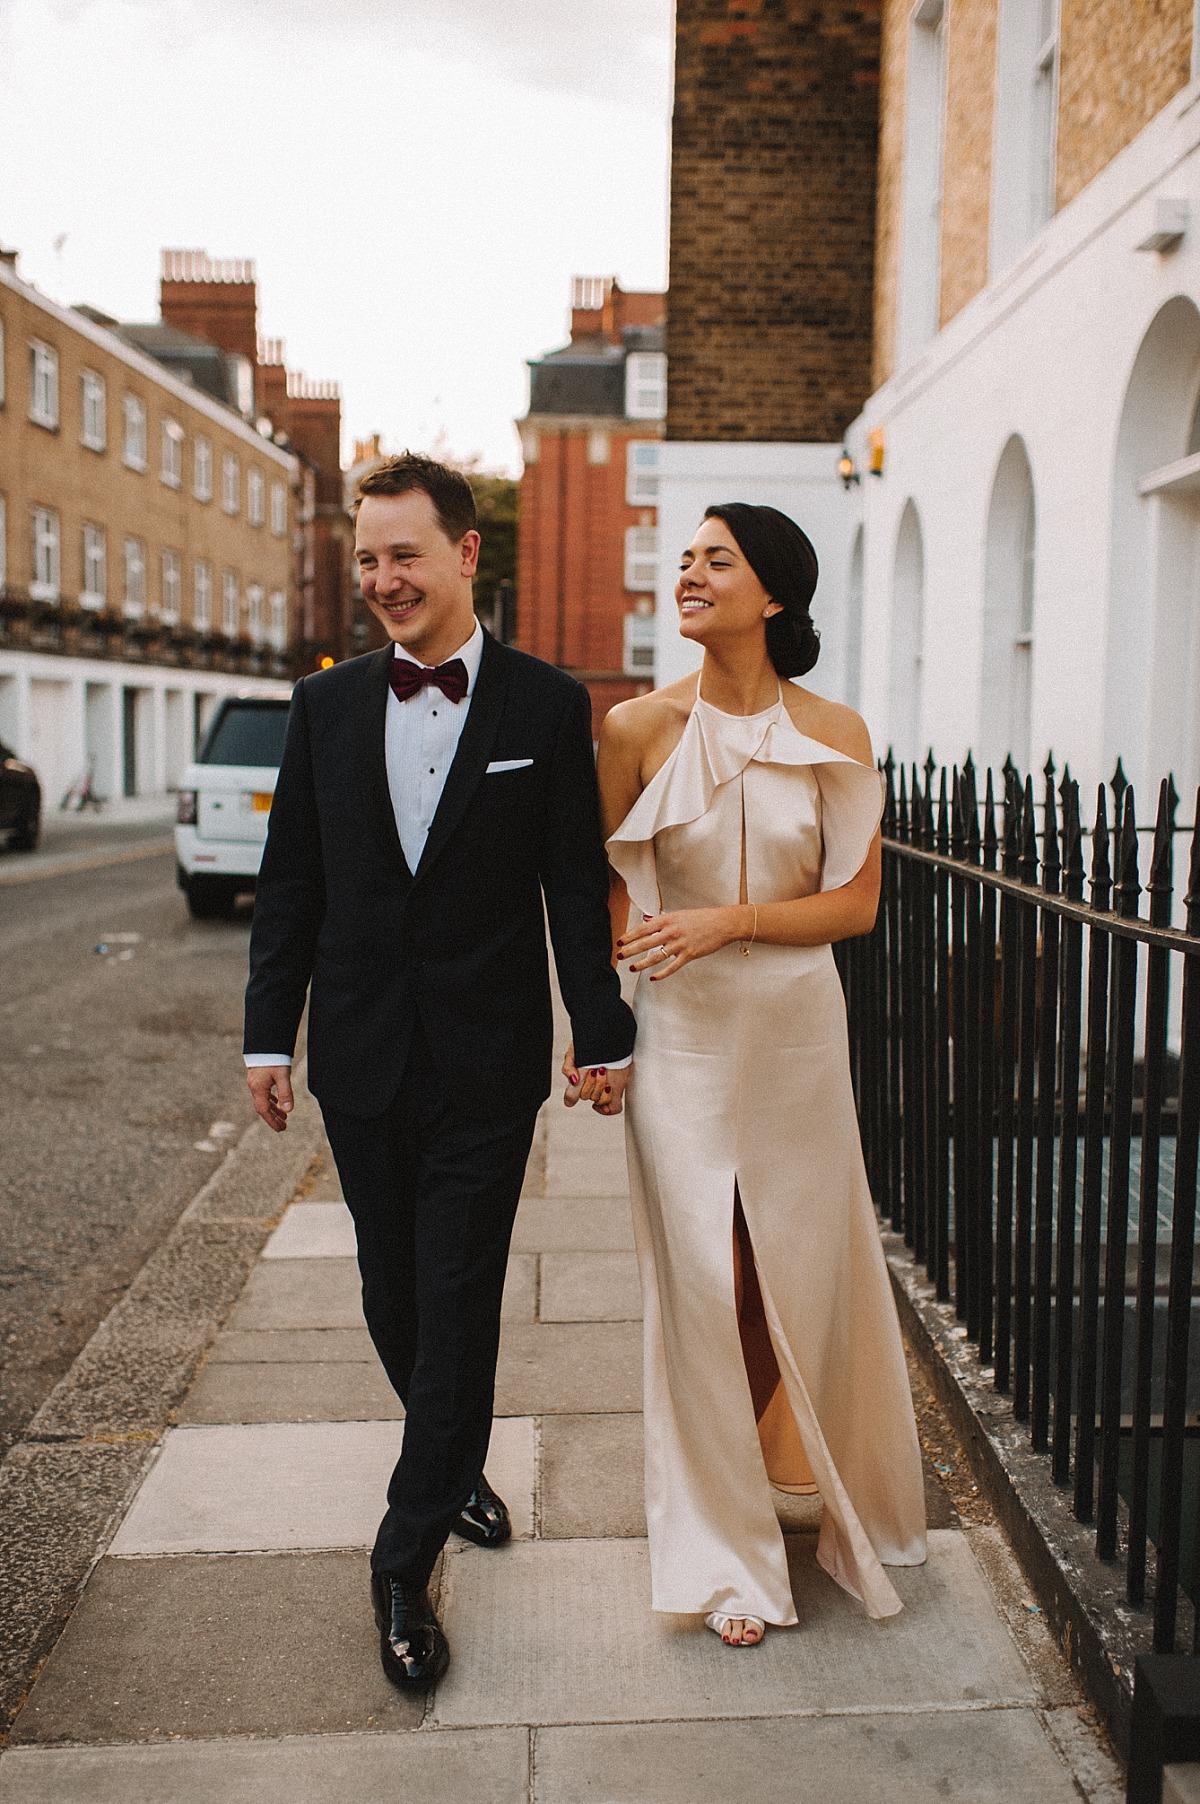 Photo of a wedding by Matt Lee Chelsea Wedding Photographer